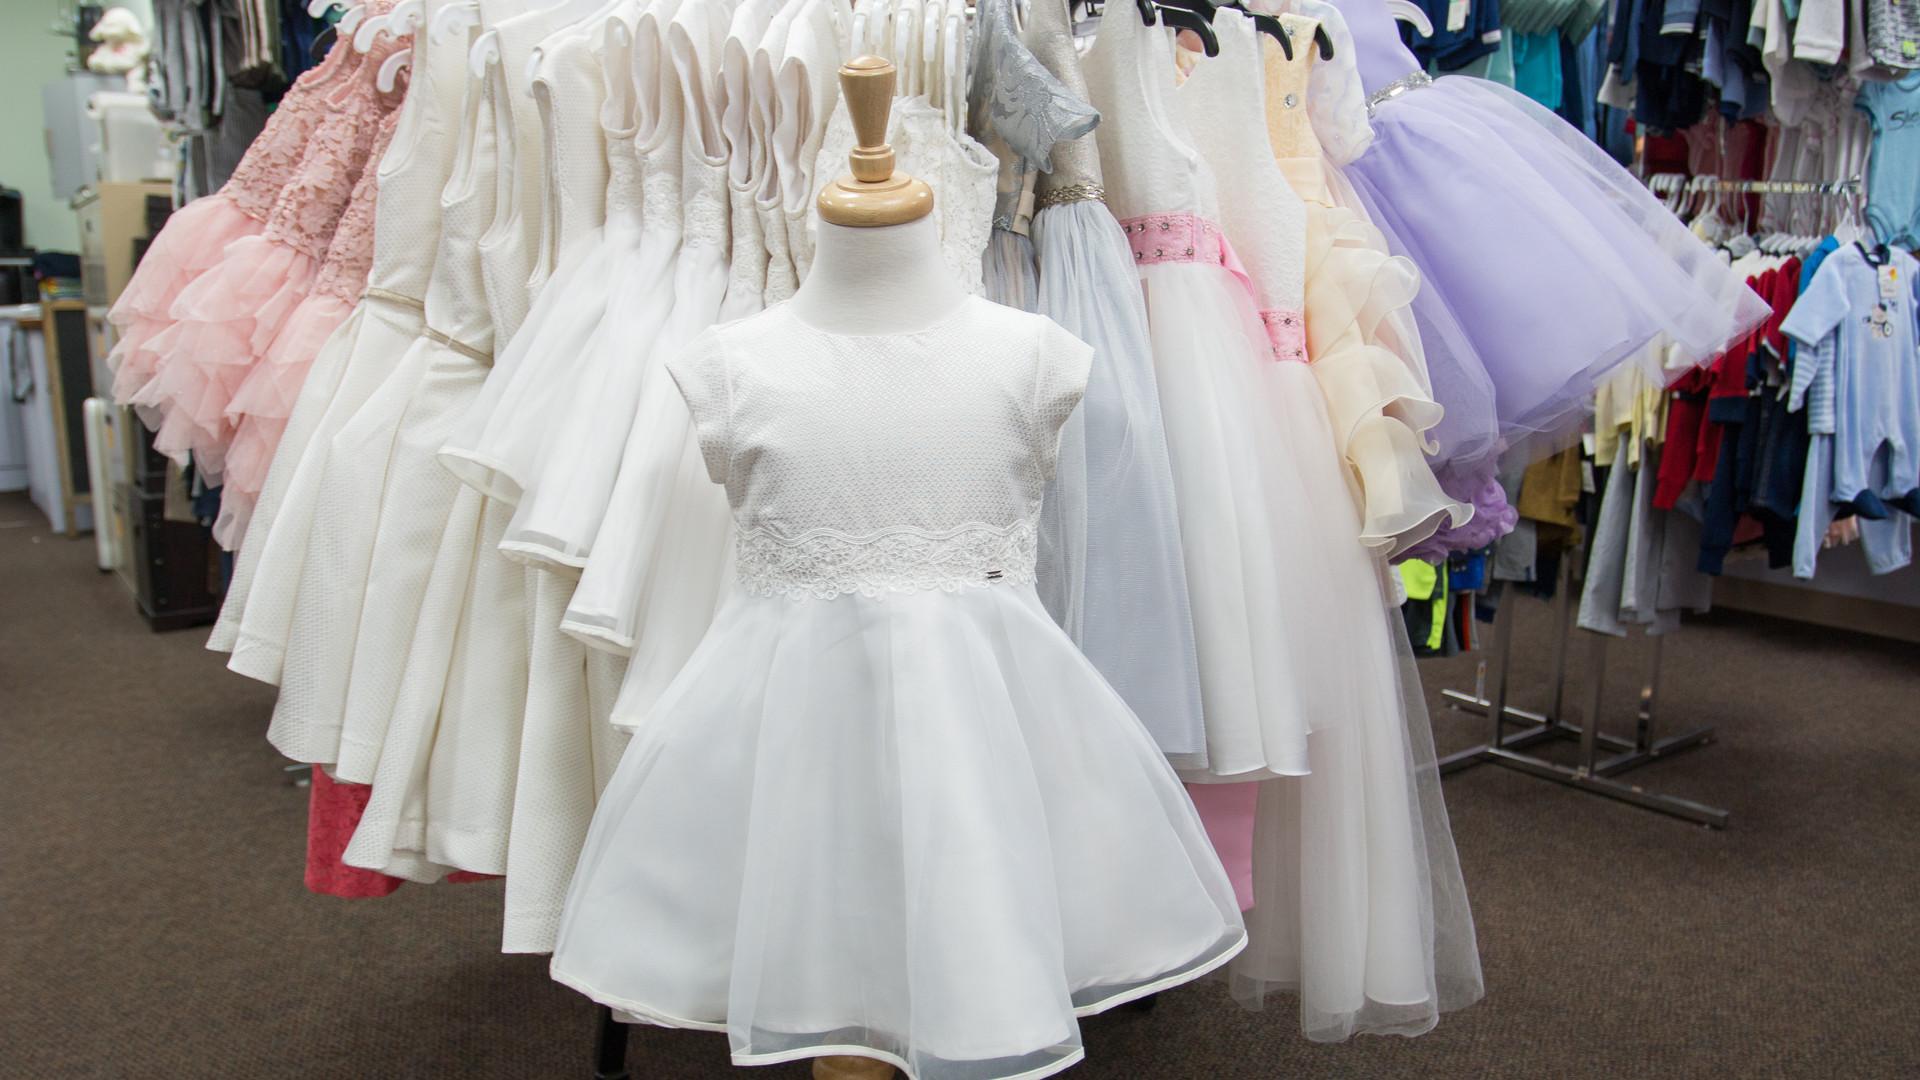 Beautiful dresses